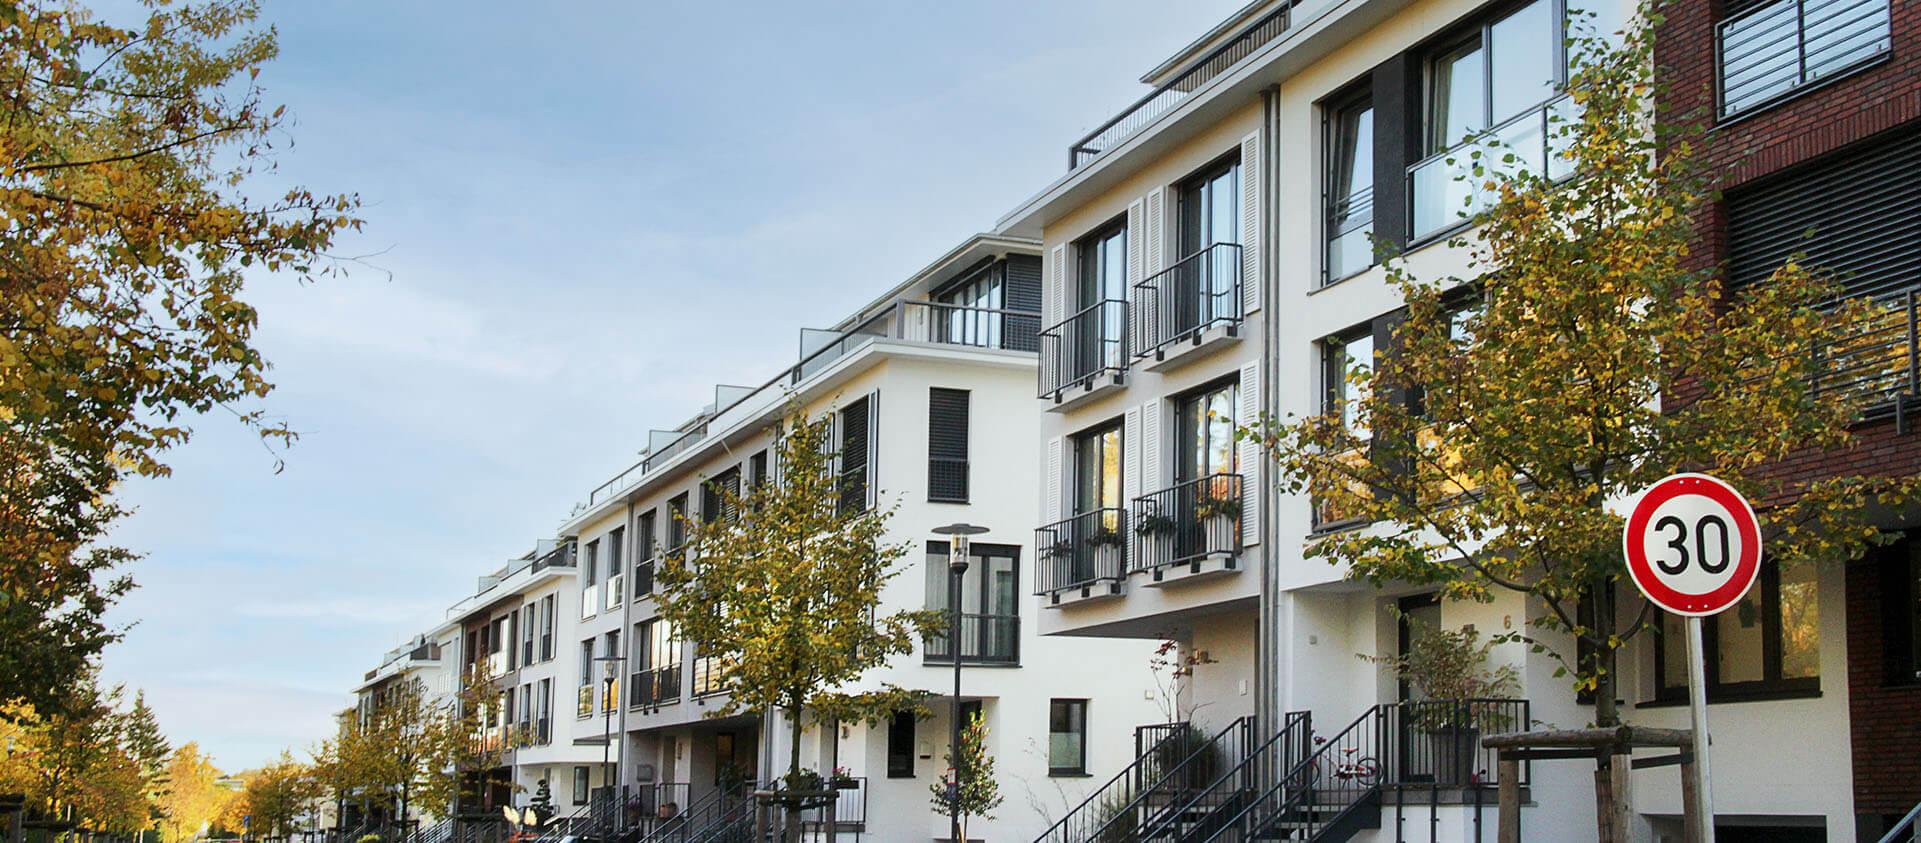 20 Townhouses Bad Soden a. Ts., Eberhard Horn Designgruppe